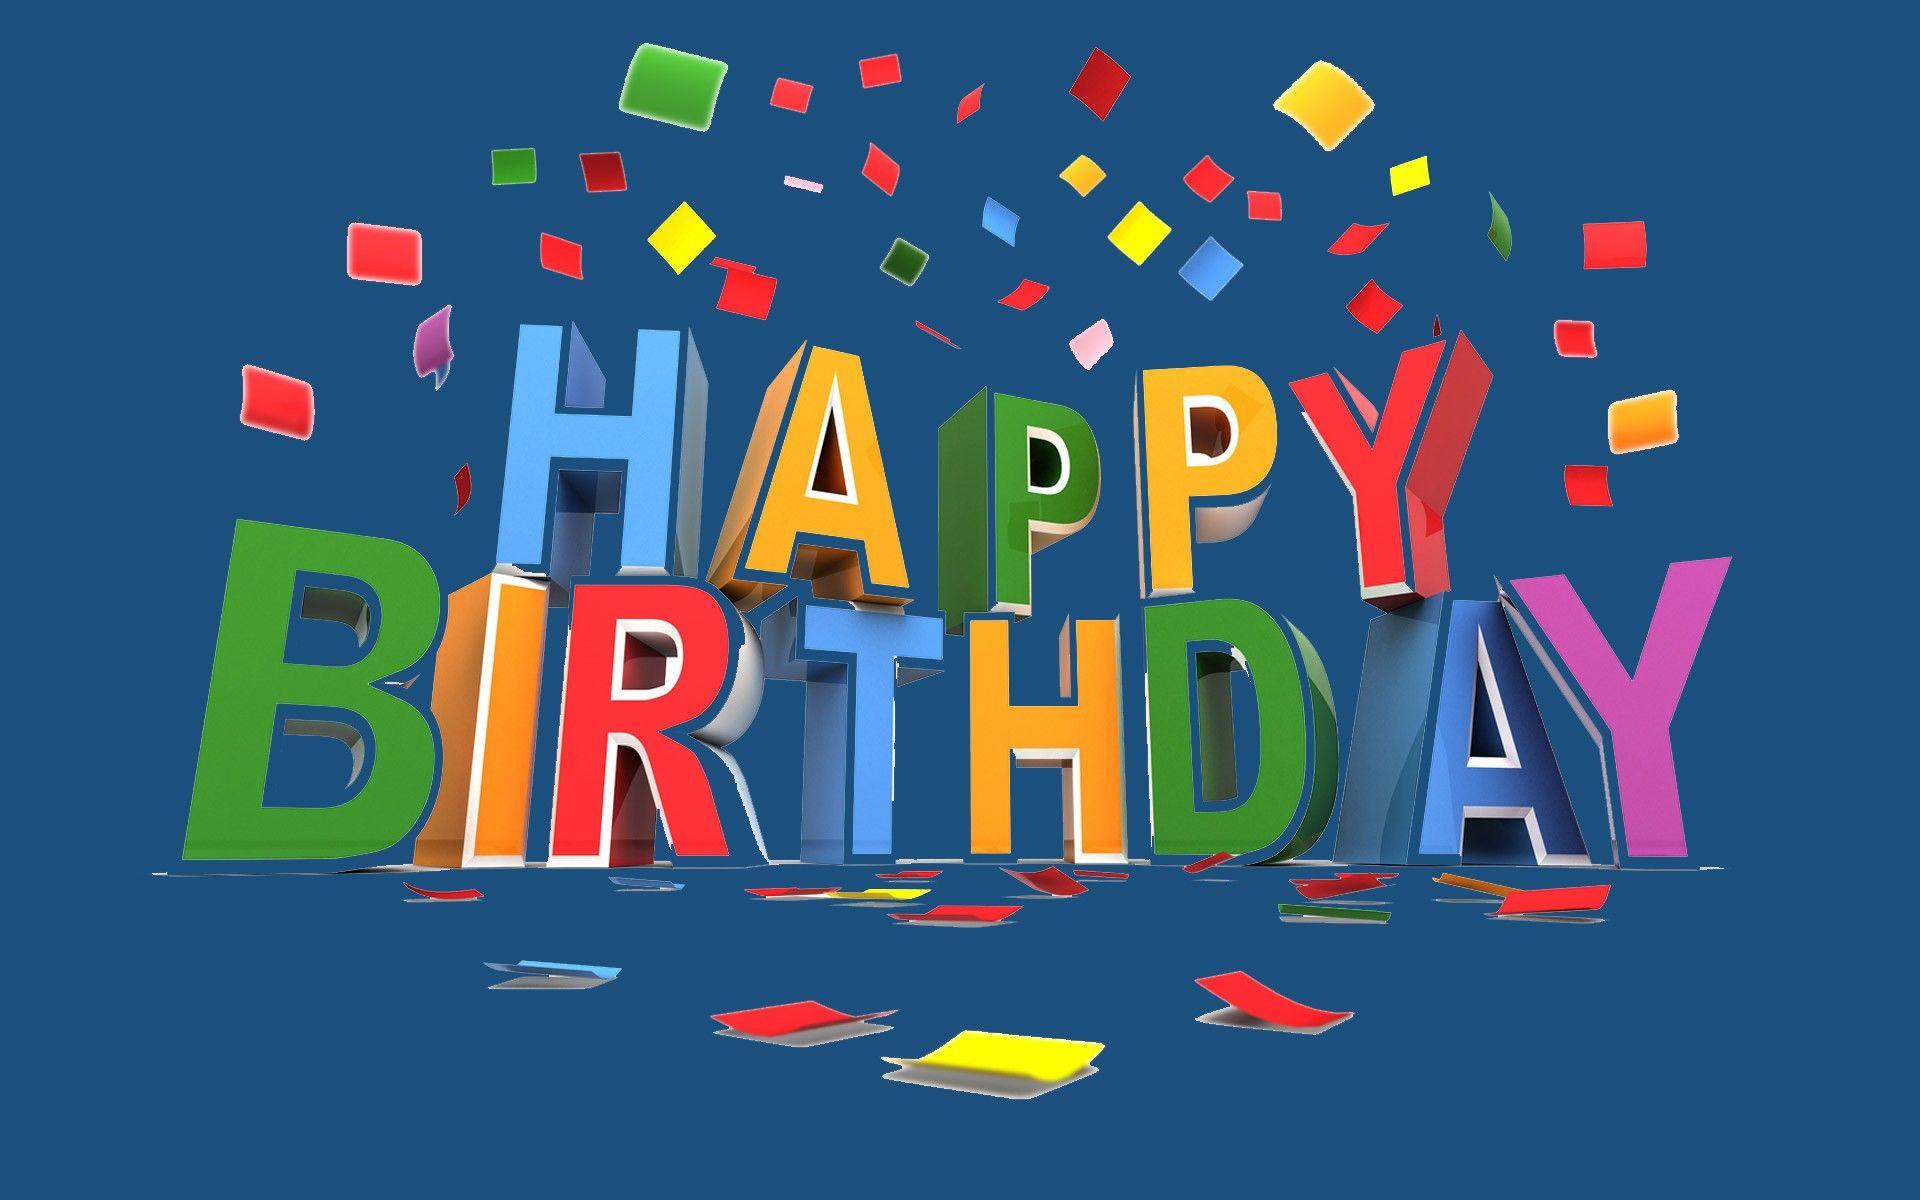 Happy Birthday Wallpaper Images HD Wallpapers Pop × Happy